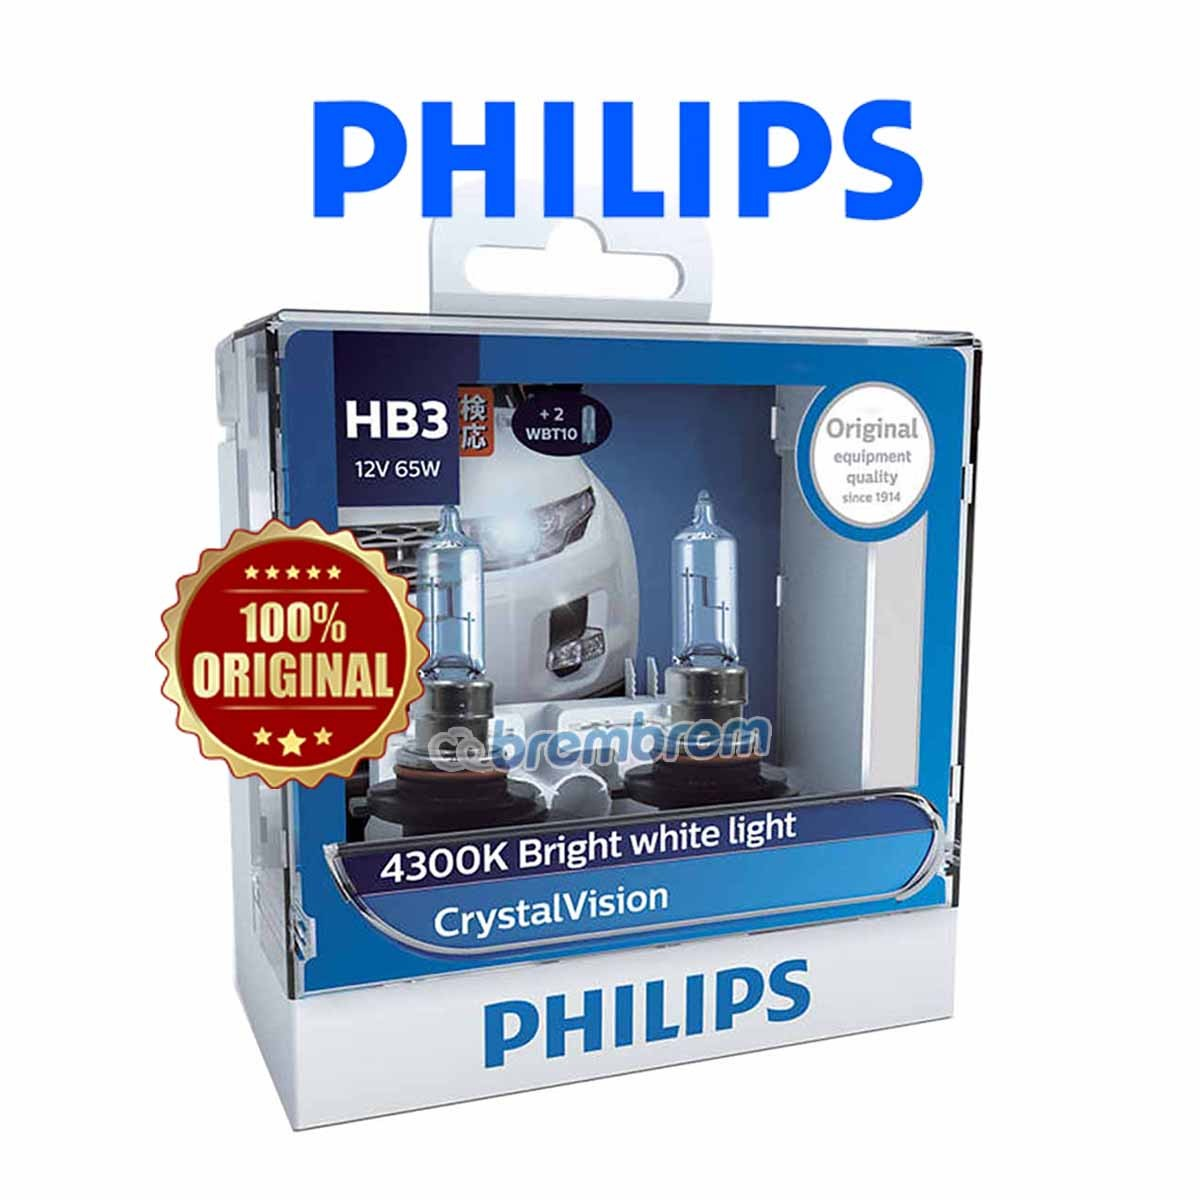 PHILIPS CRYSTAL VISION HB3 (4300K) - LAMPU HALOGEN